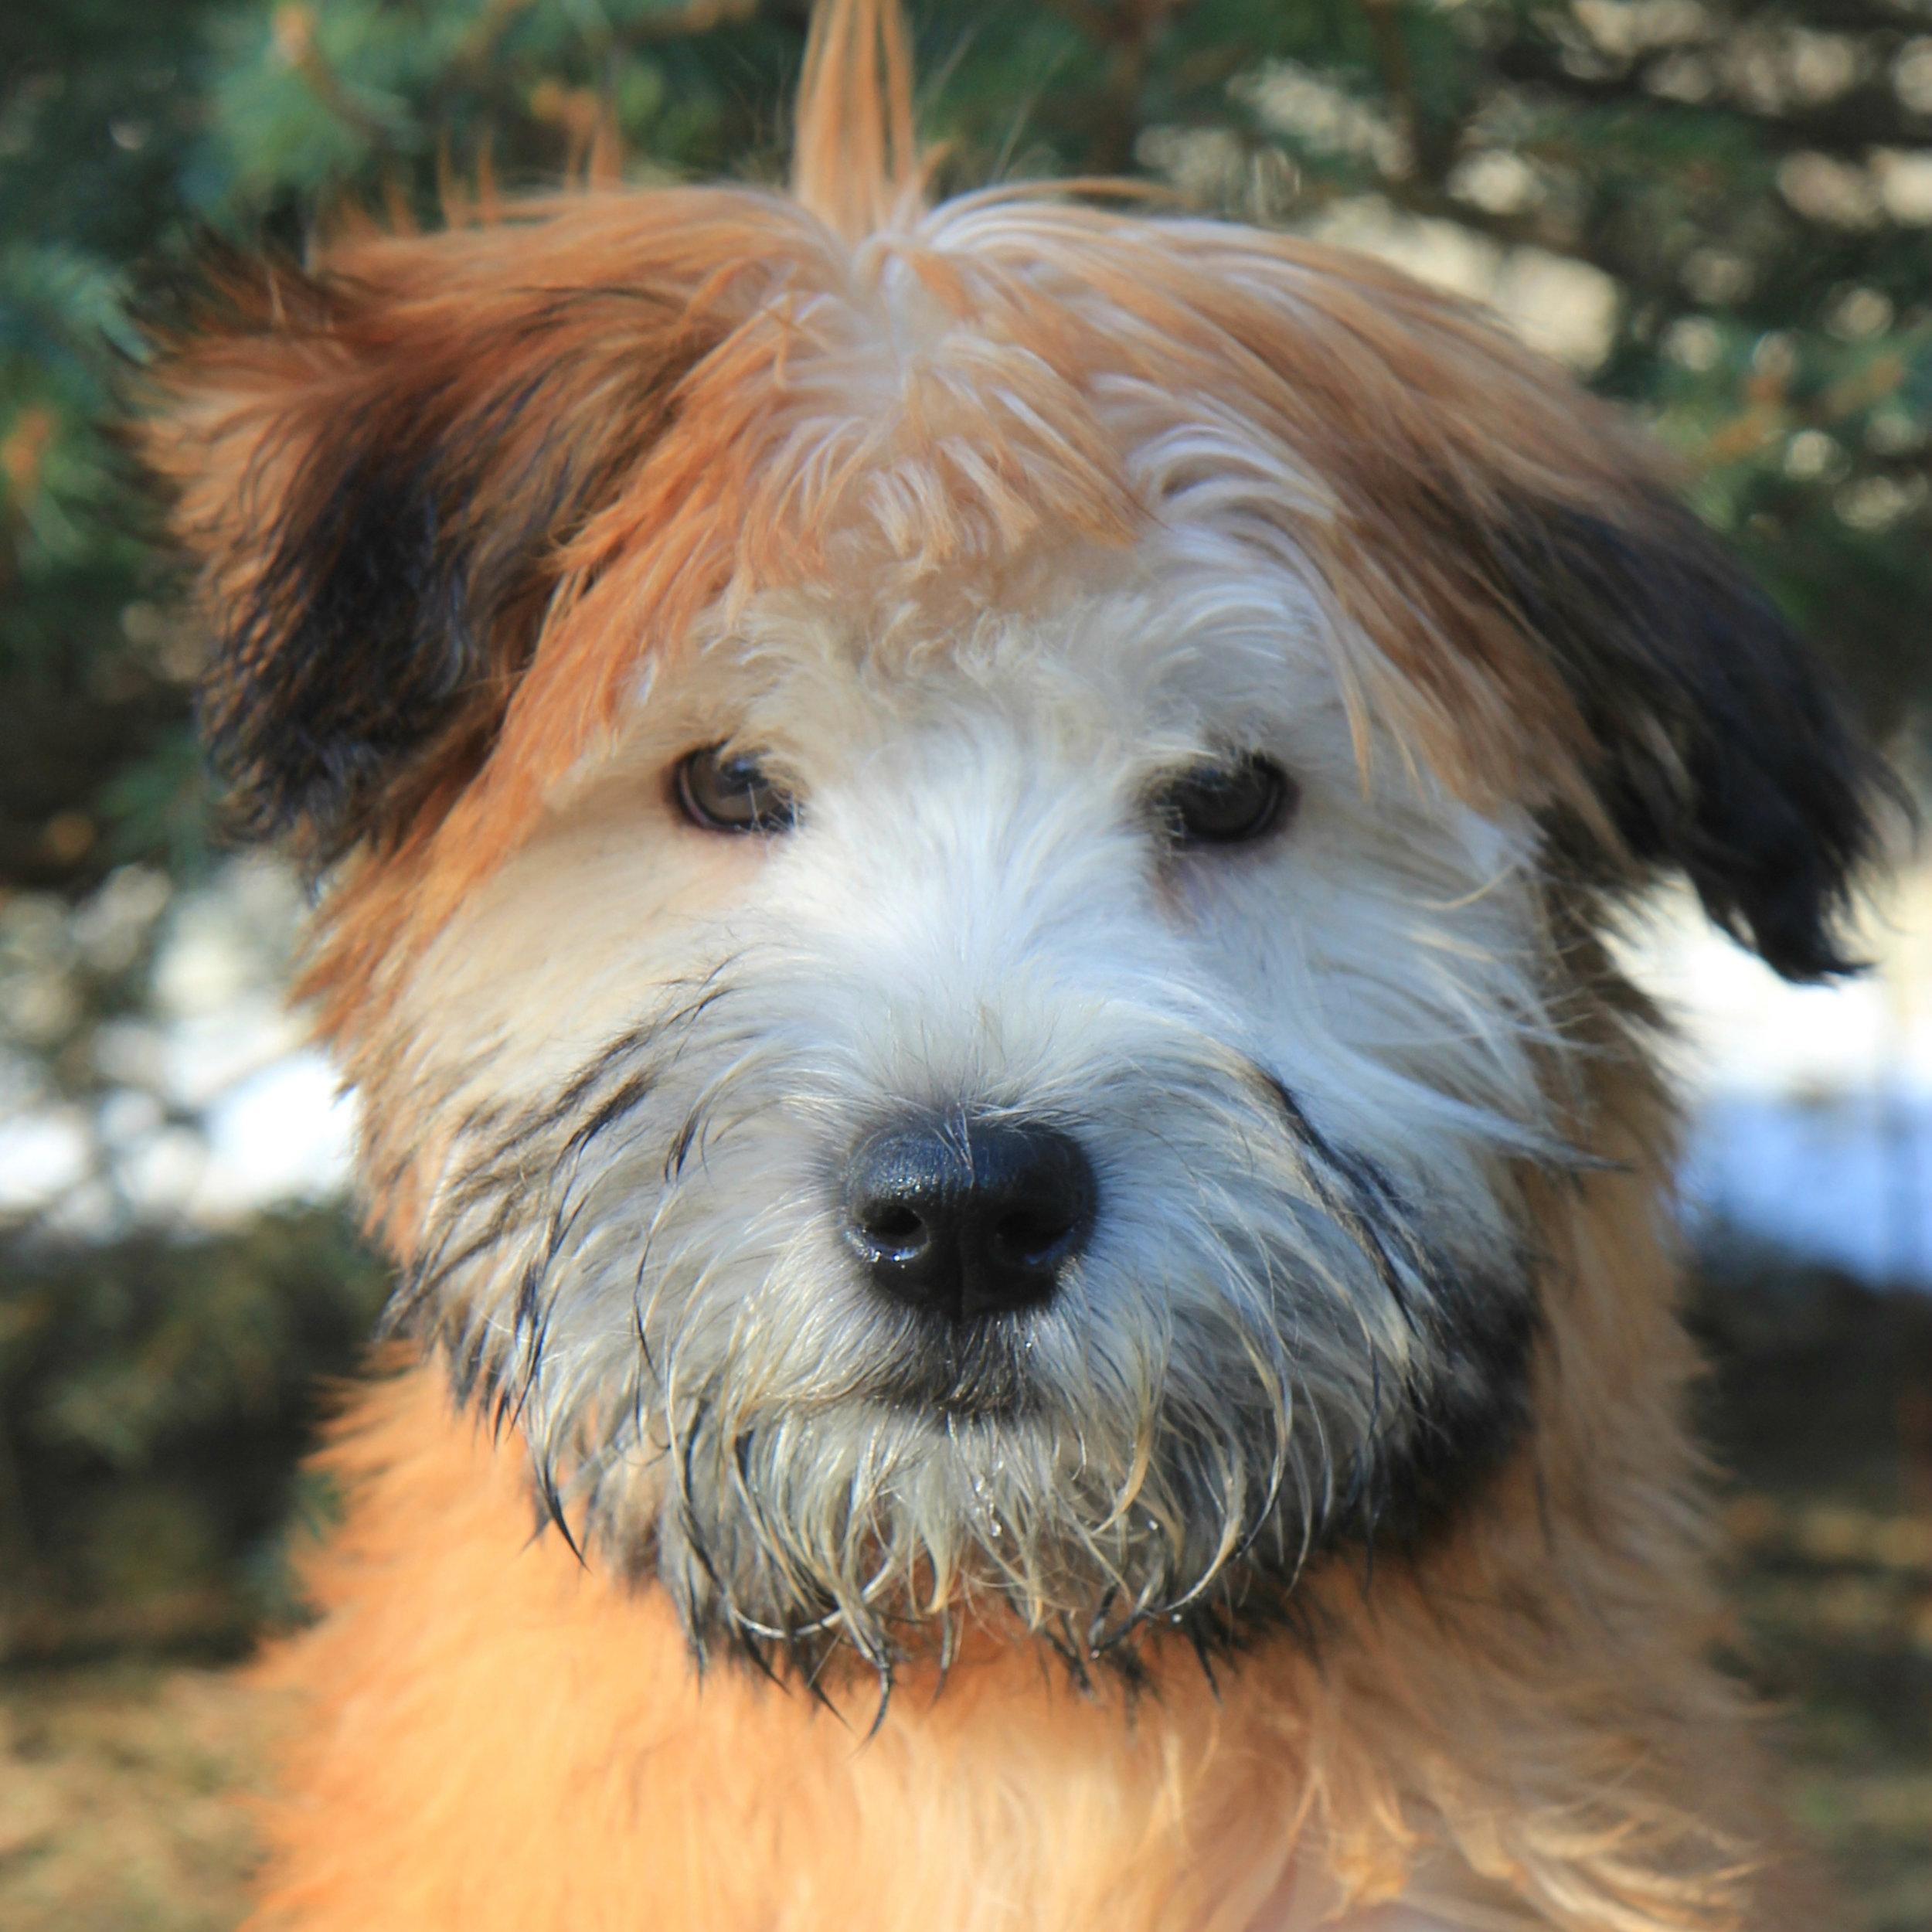 Jenna the Soft Coated Wheaten Terrier